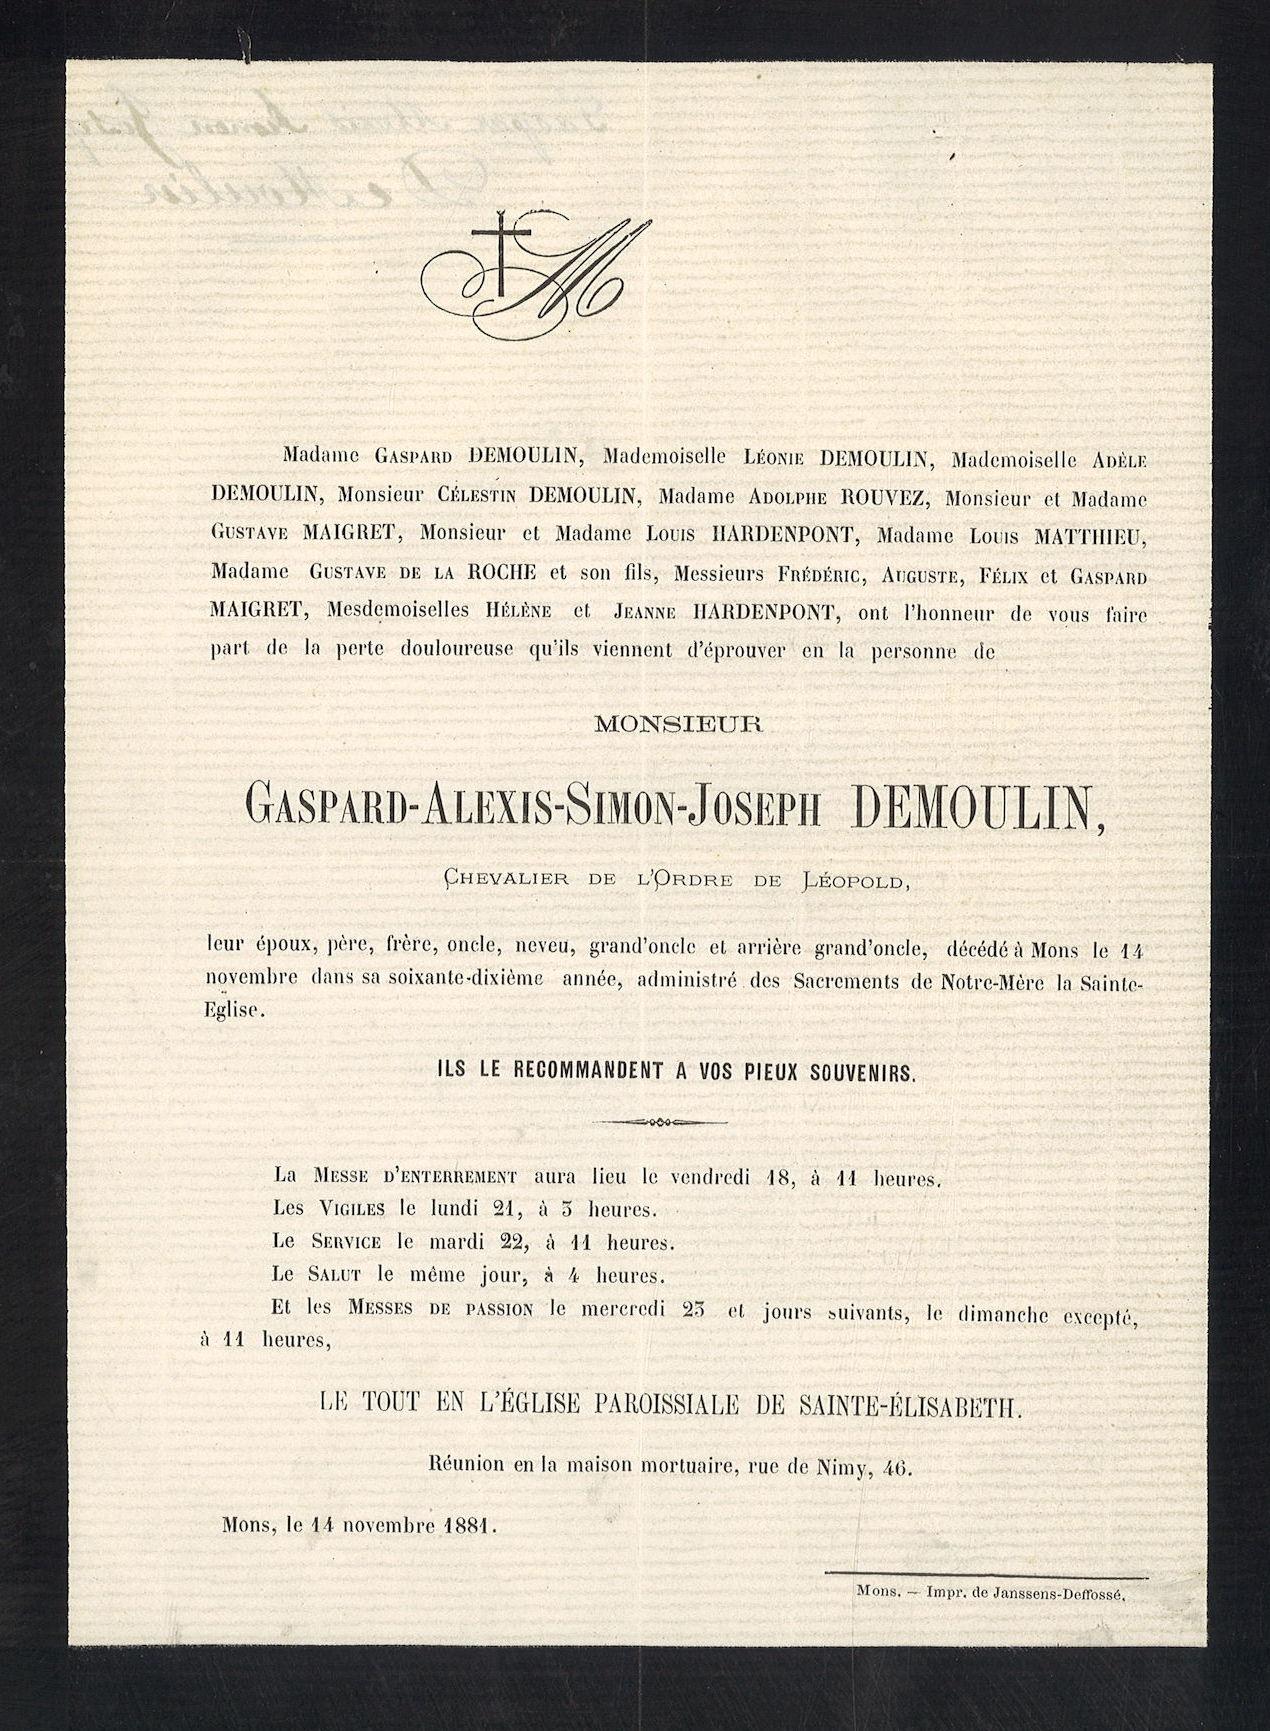 Gaspard-Alexis-Simon-Joseph Demoulin